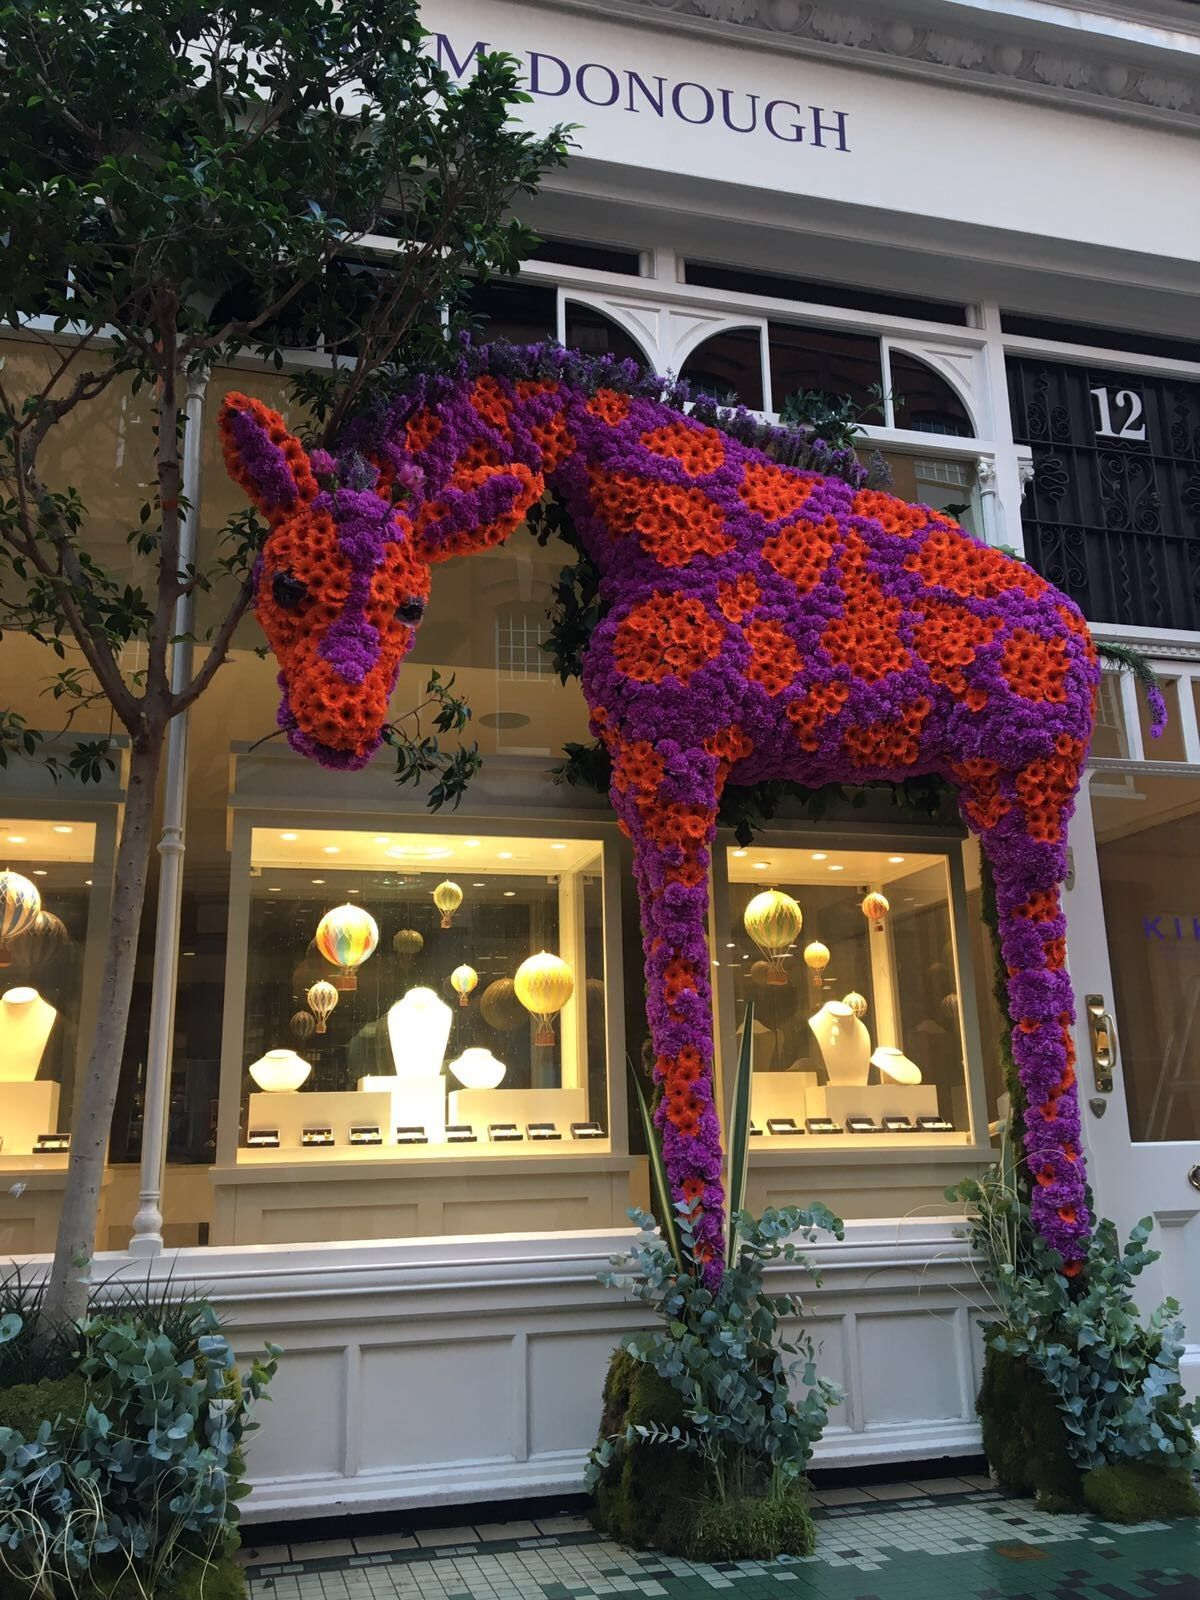 New Covent Garden Market is London's finest fruit, veg and